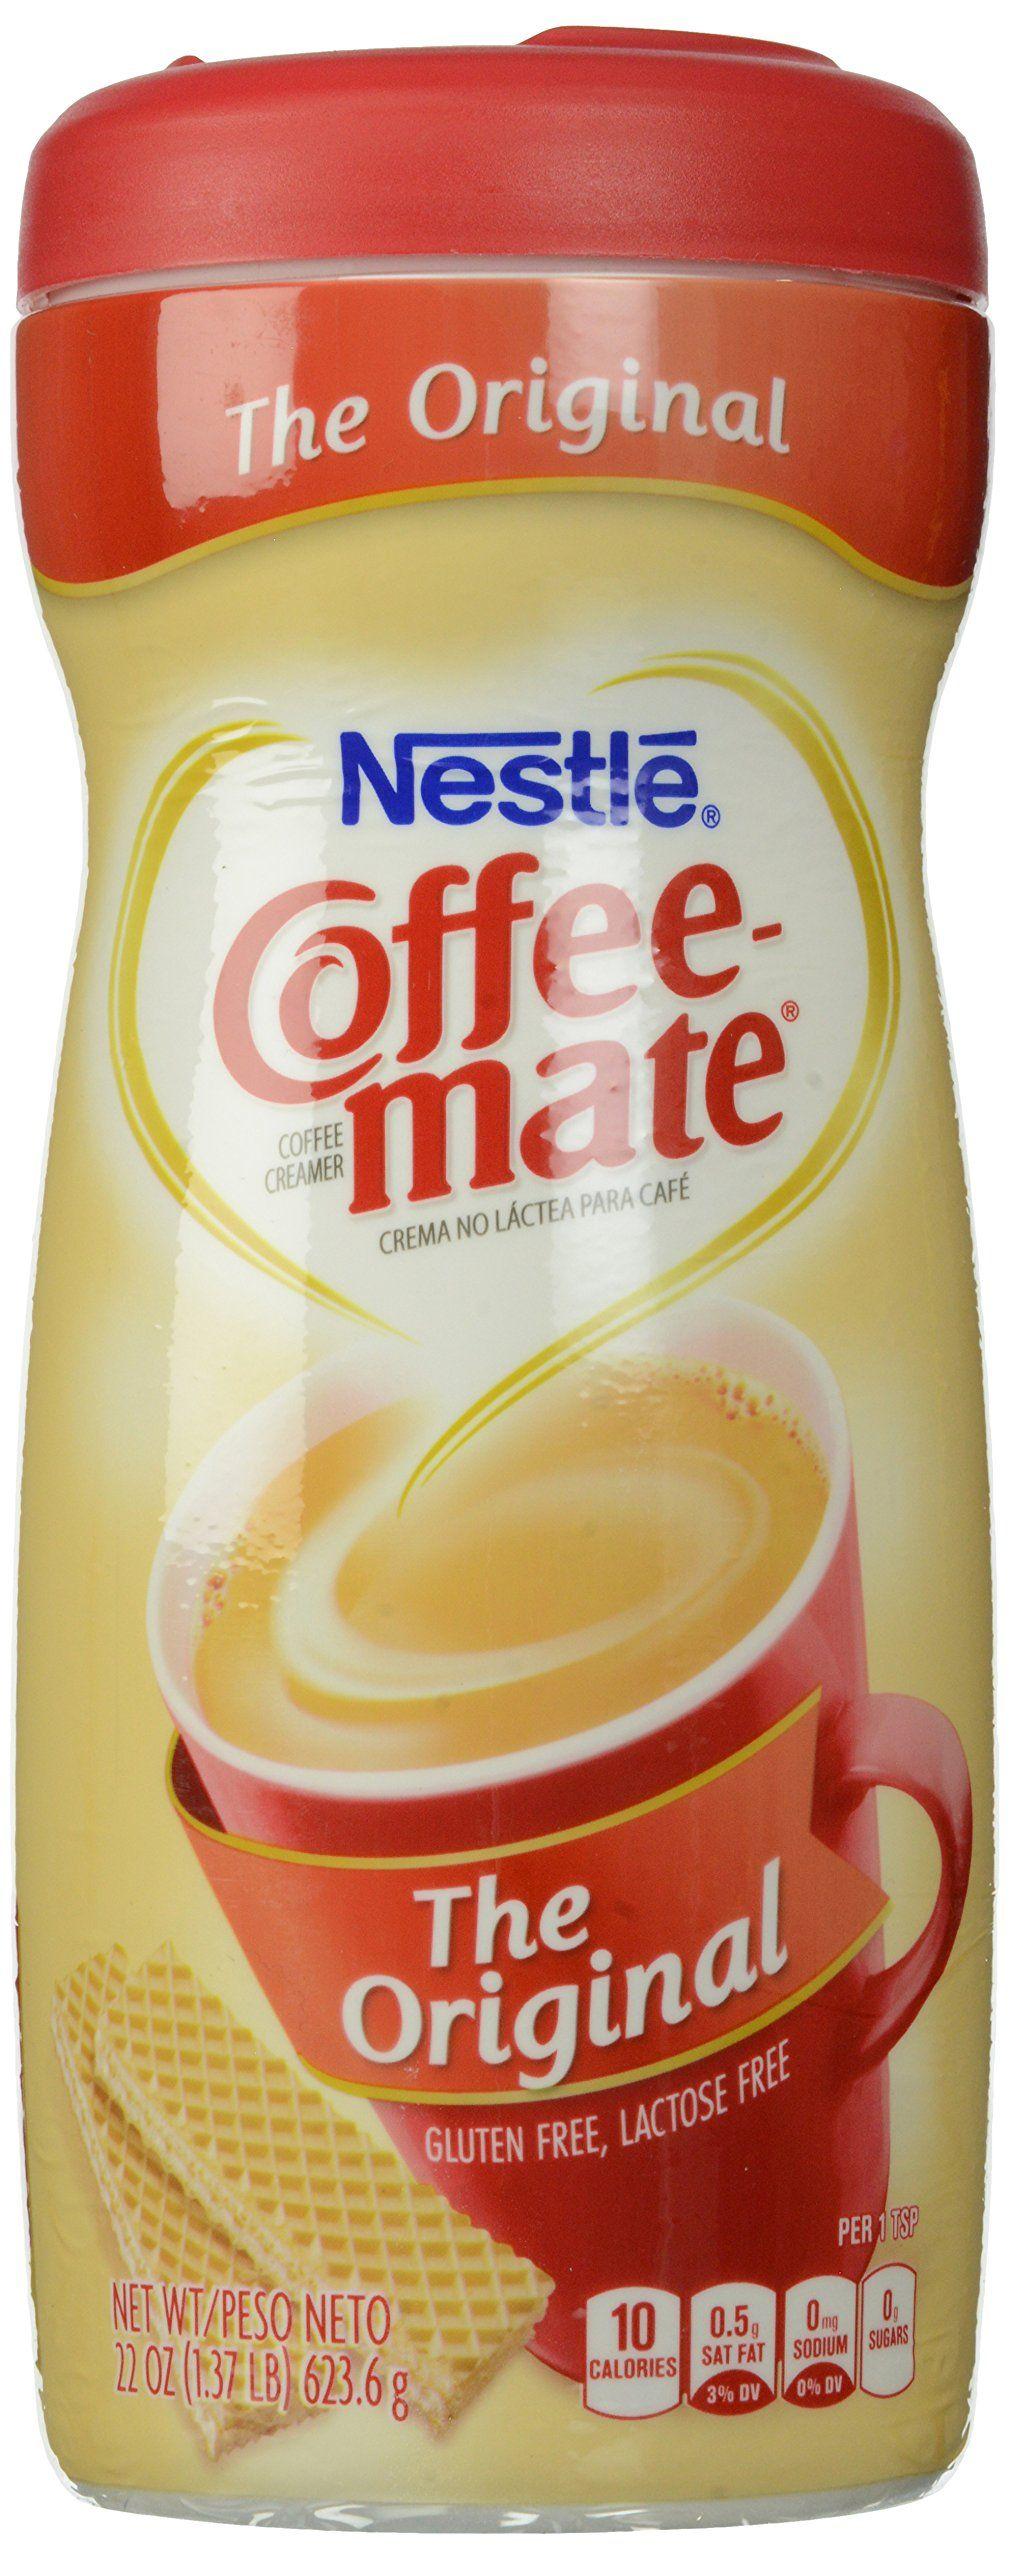 Coffeemate coffee creamer powder original 22 ounce see